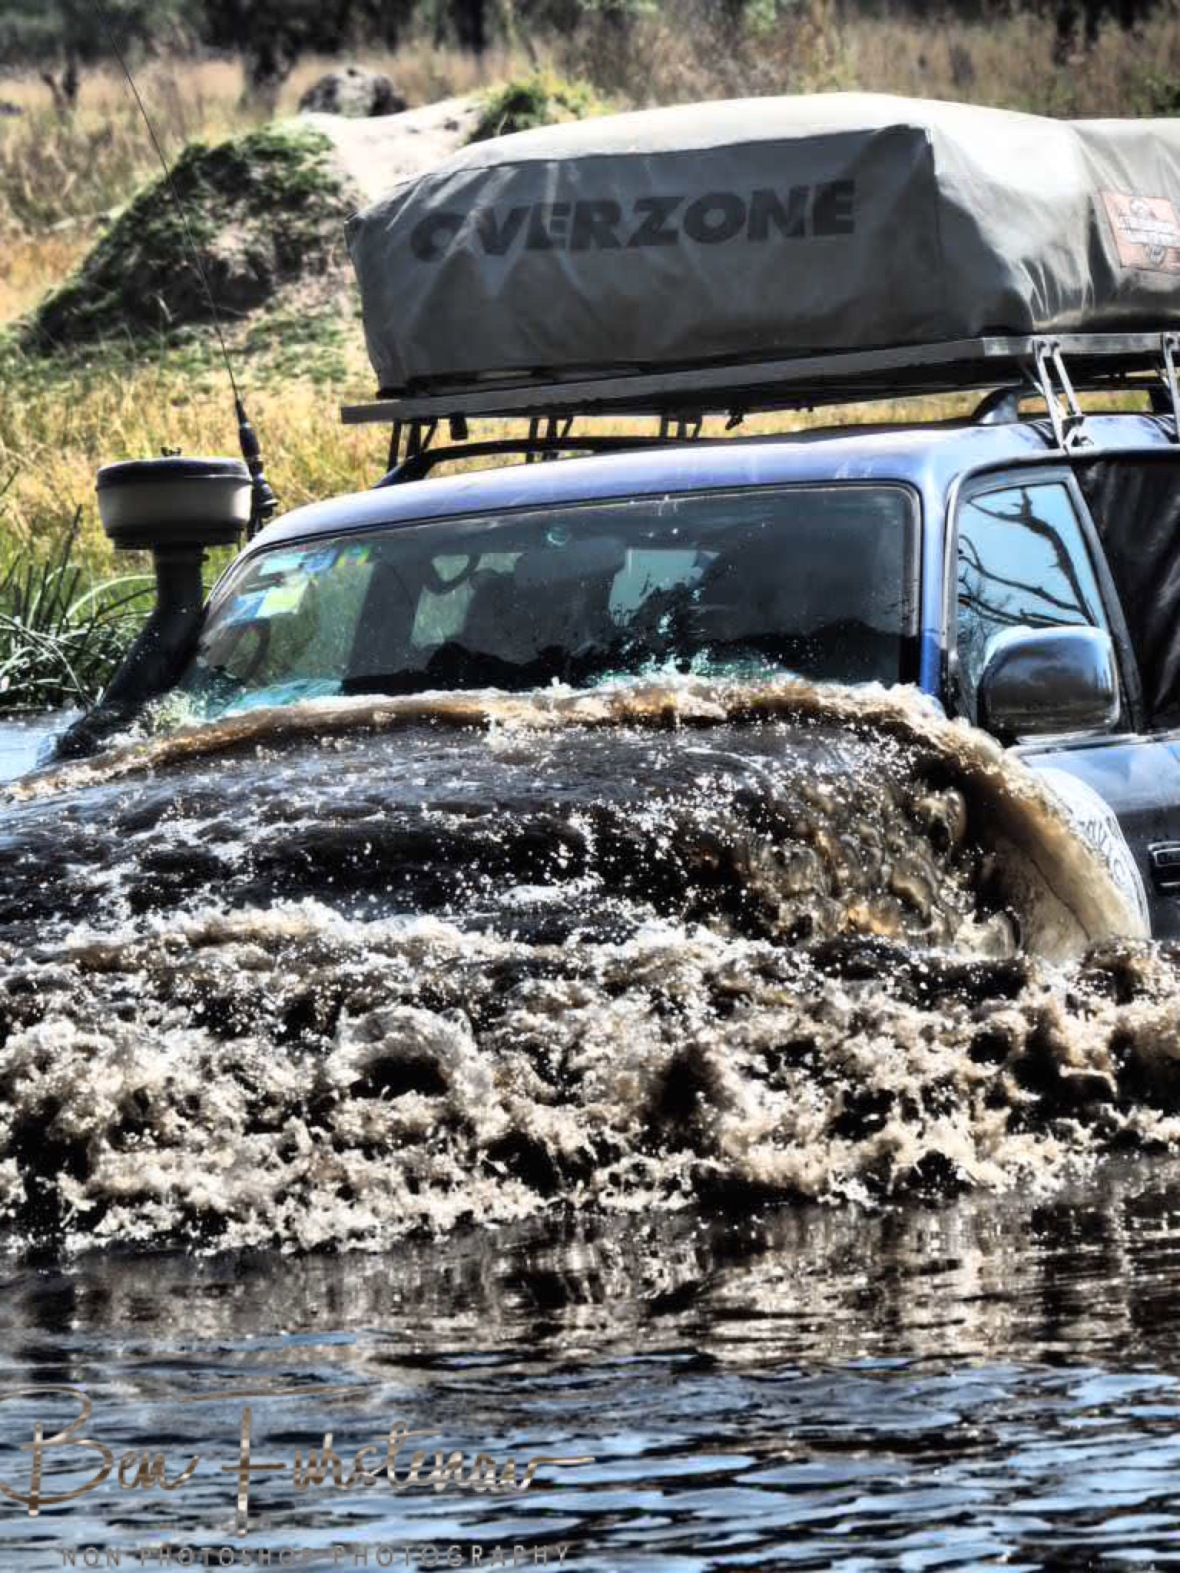 Car wash Botswana style, Kwai Region, Okavango Delta